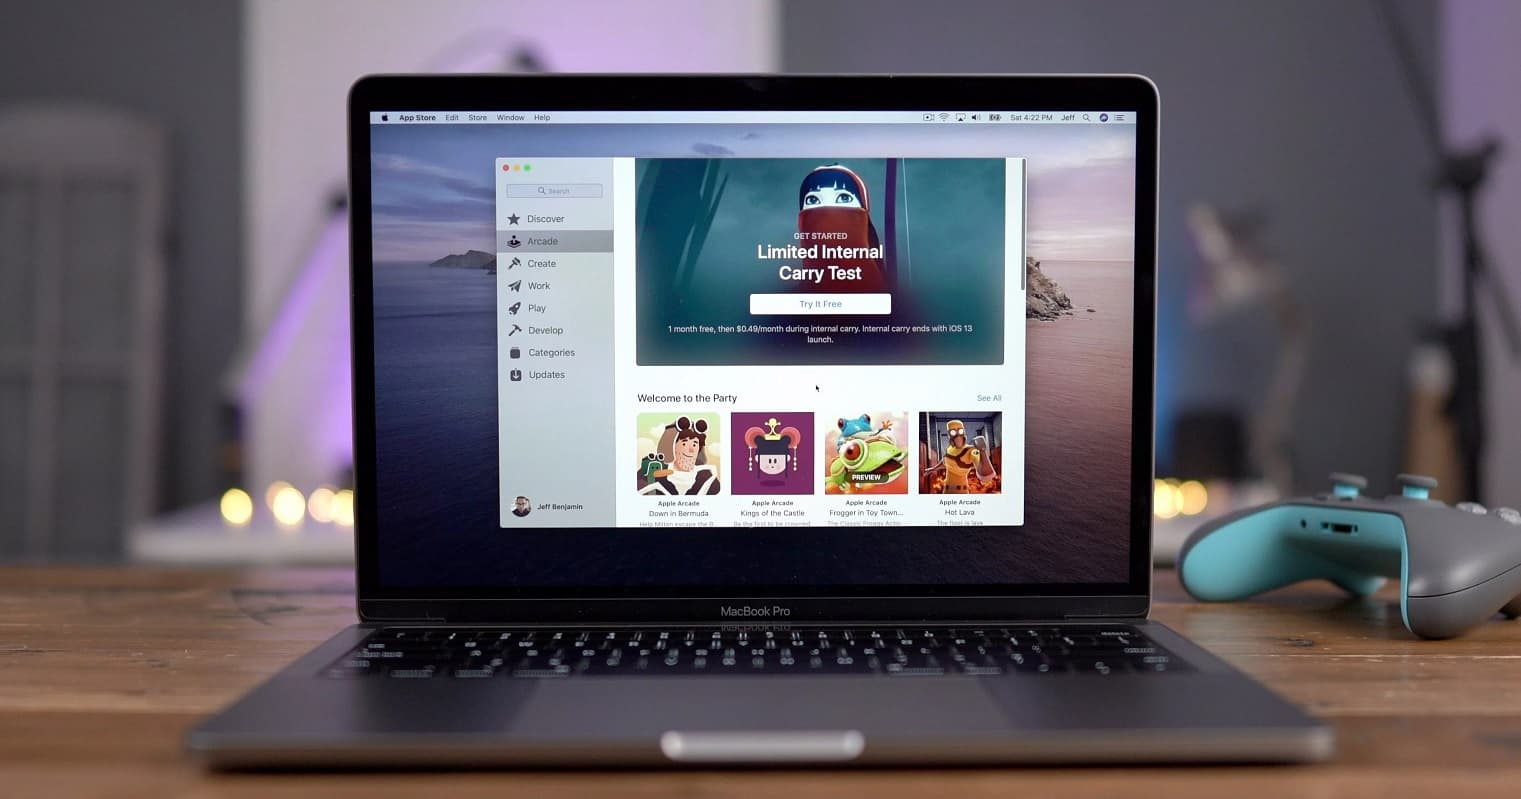 apple arcade on macbook